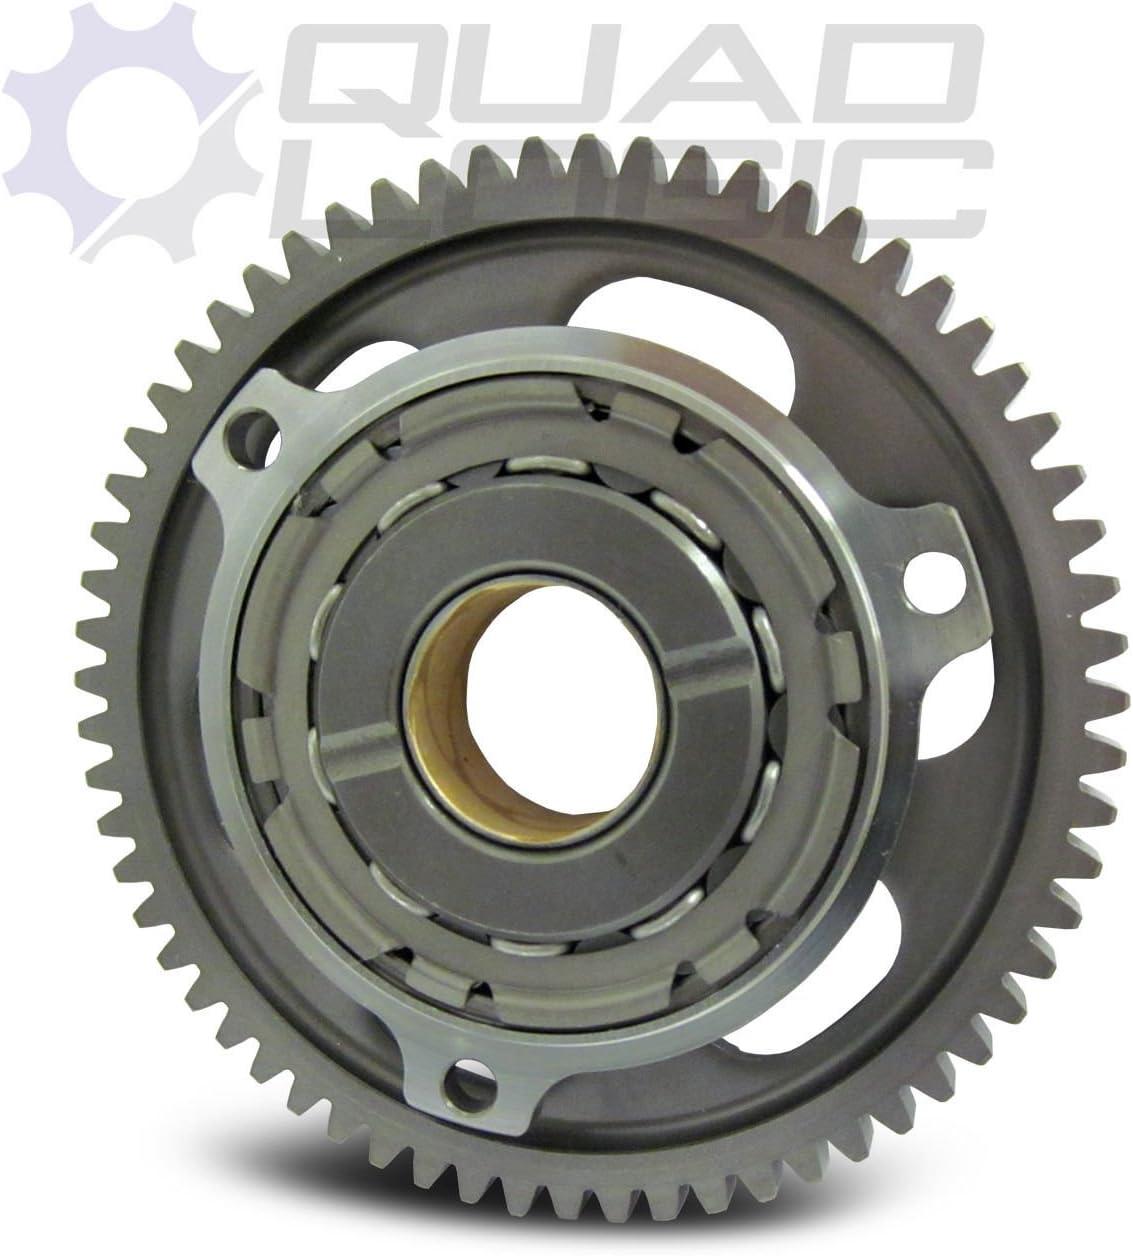 IMPROVED NEW Flywheel Puller For Polaris RZR 900XP 2011-2014 LH 50mm 1.5 Xp 900